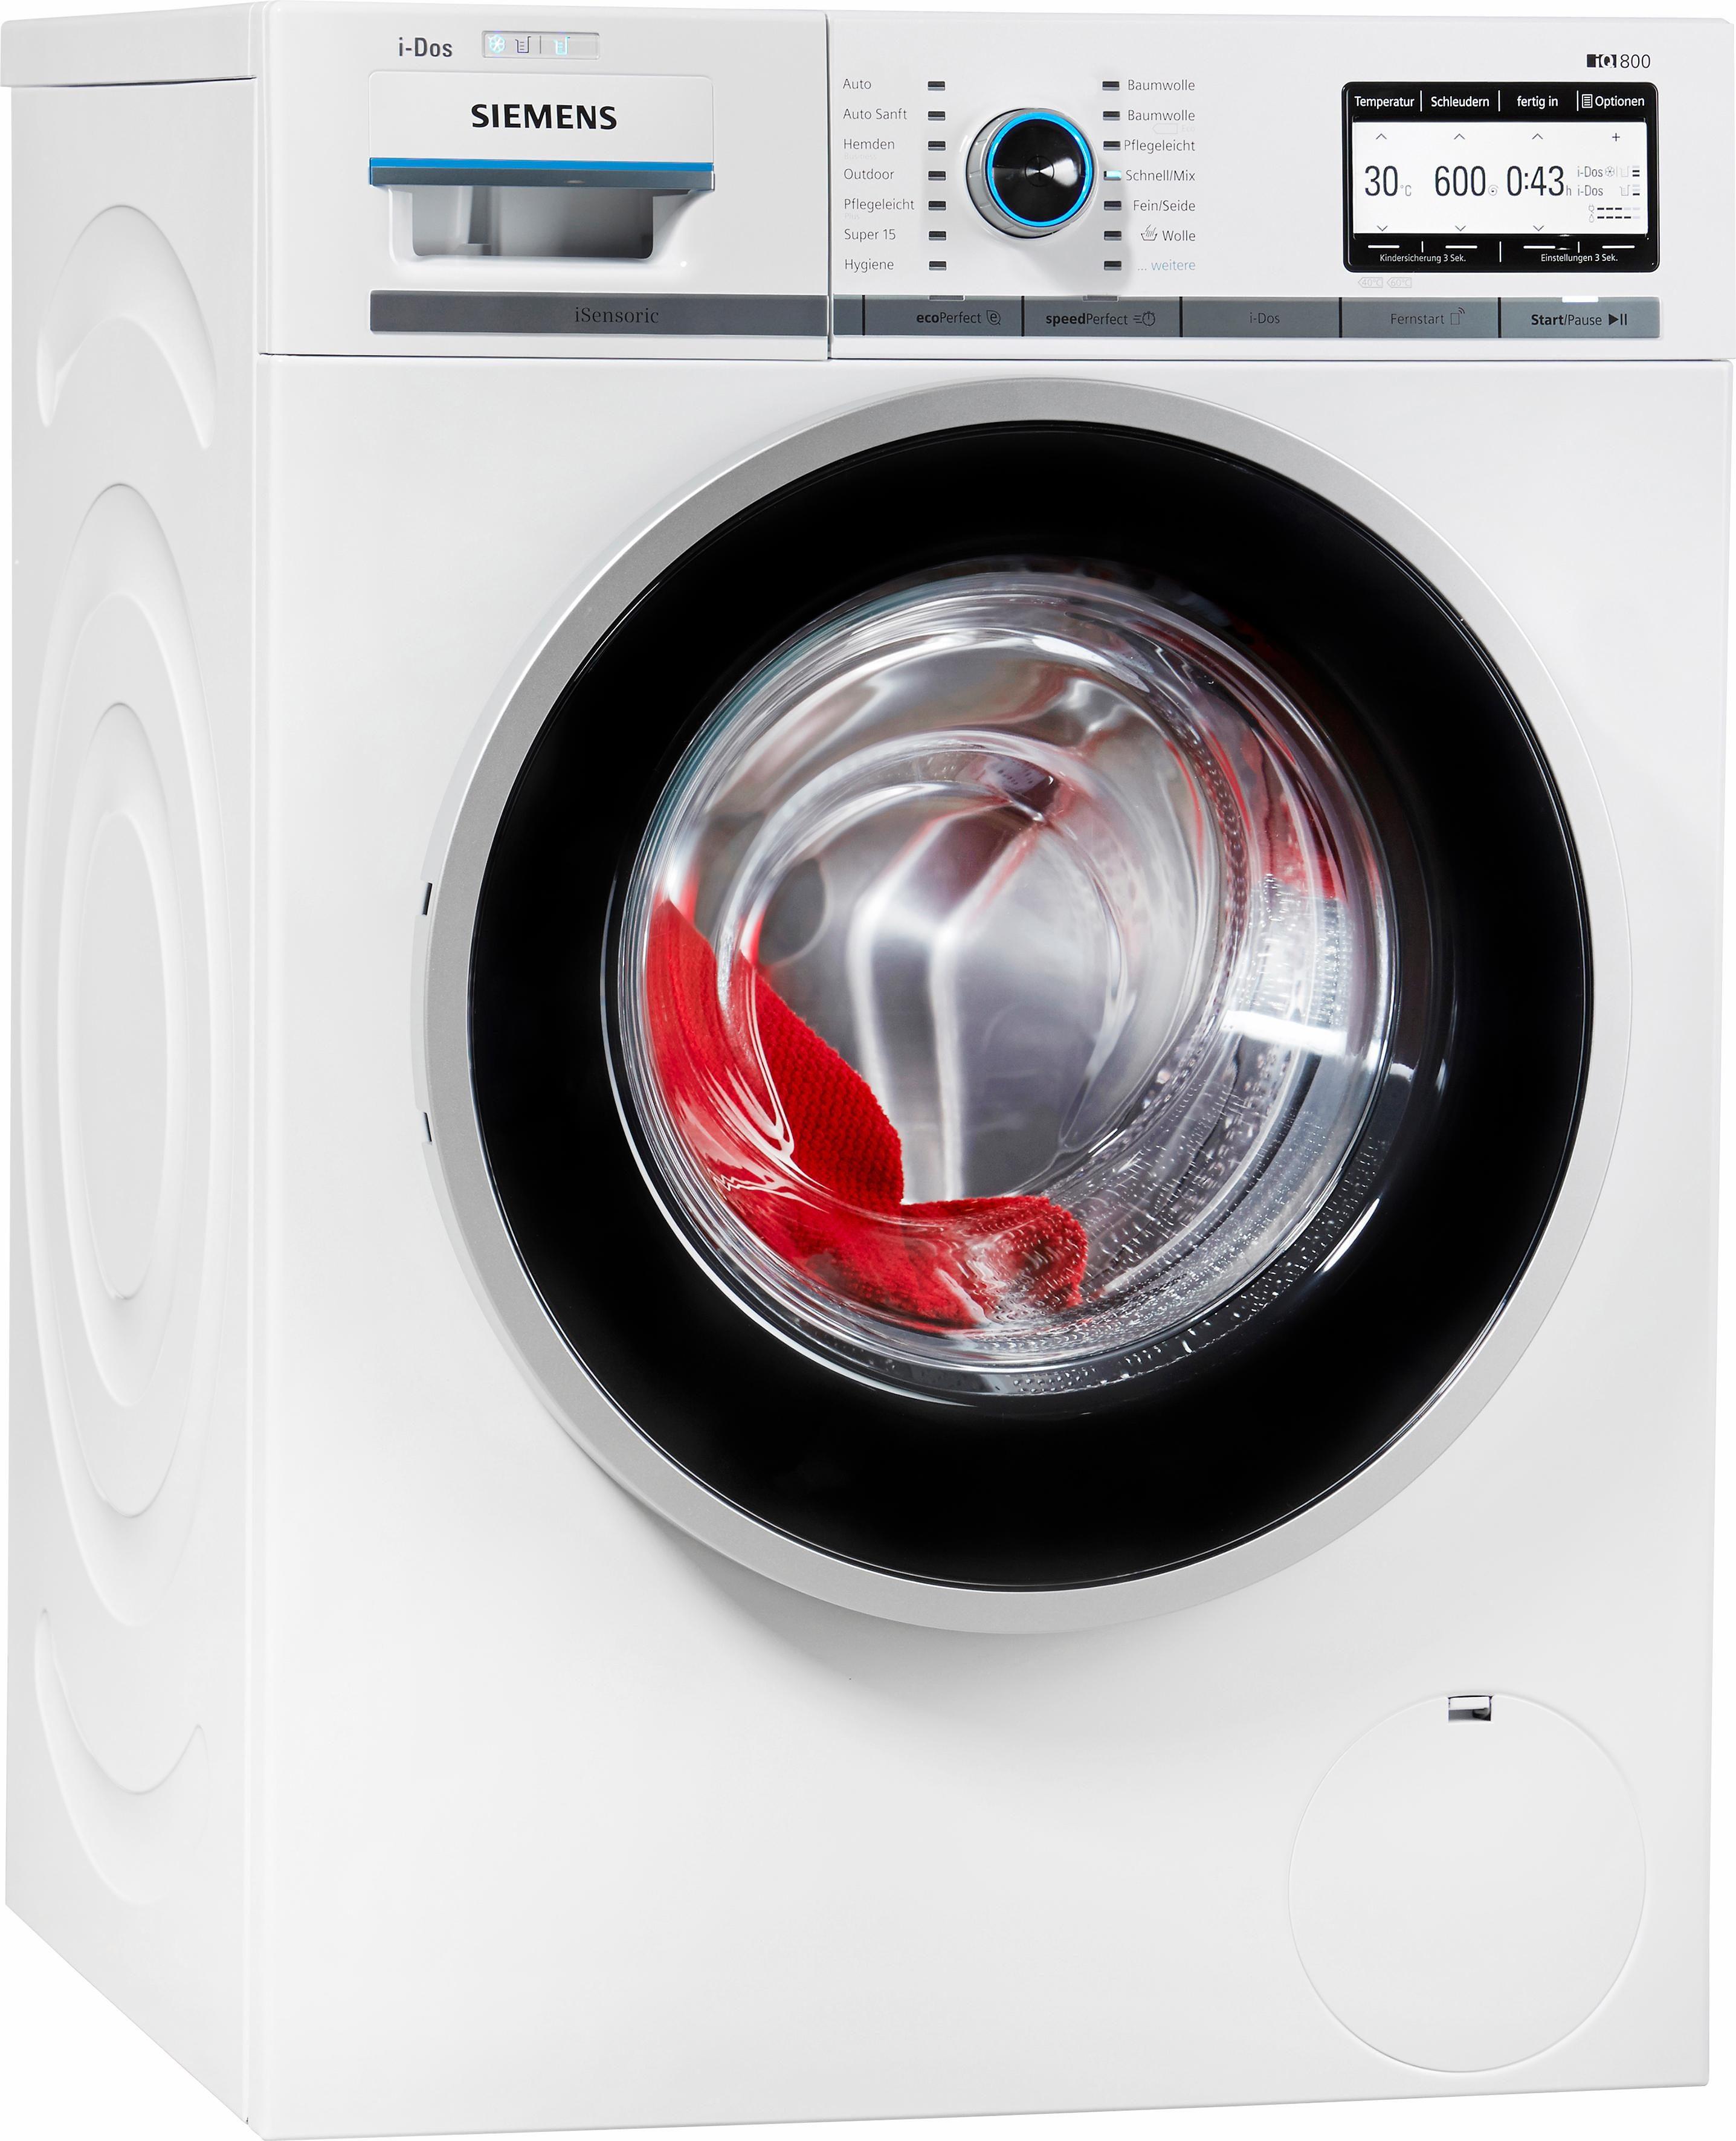 SIEMENS Waschmaschine WM6YH840, A+++, 8 kg, 1600 U/Min